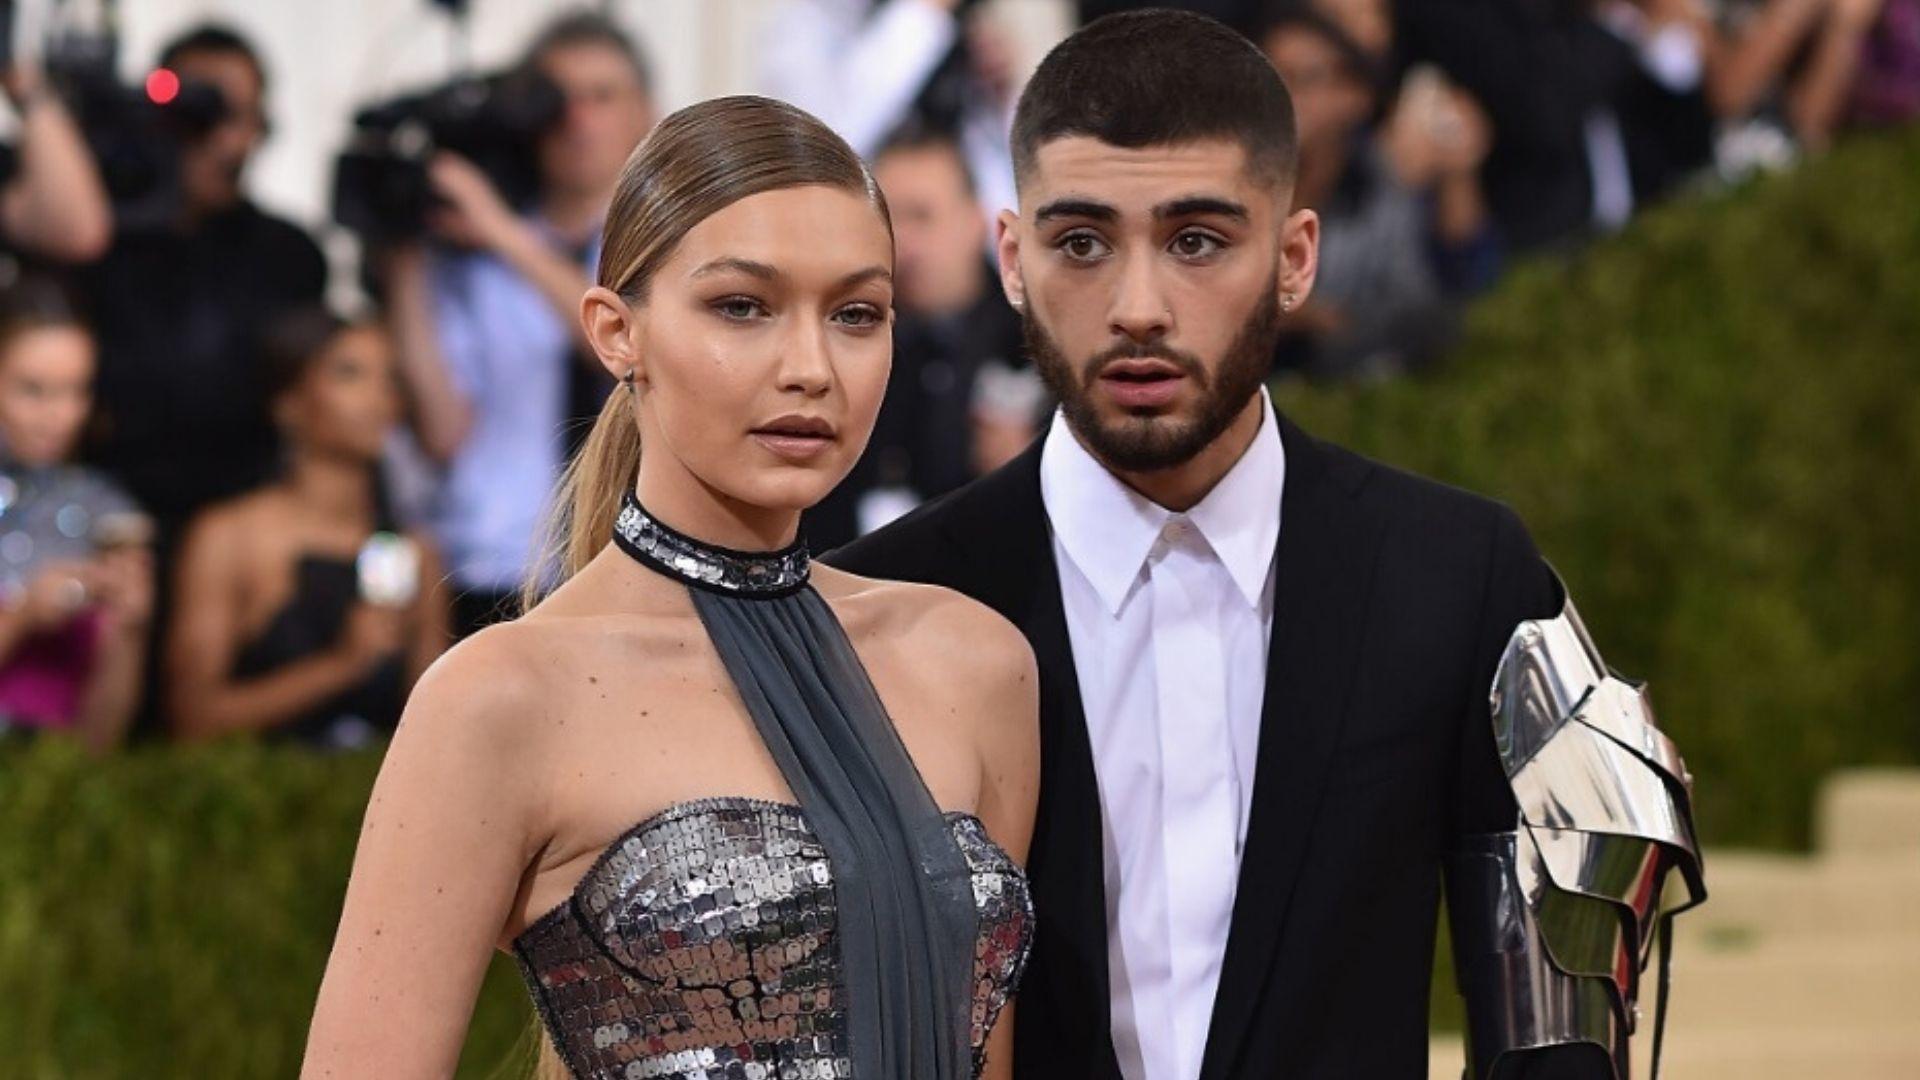 Are Gigi Hadid And Zayn Malik Rekindling Their Romance?